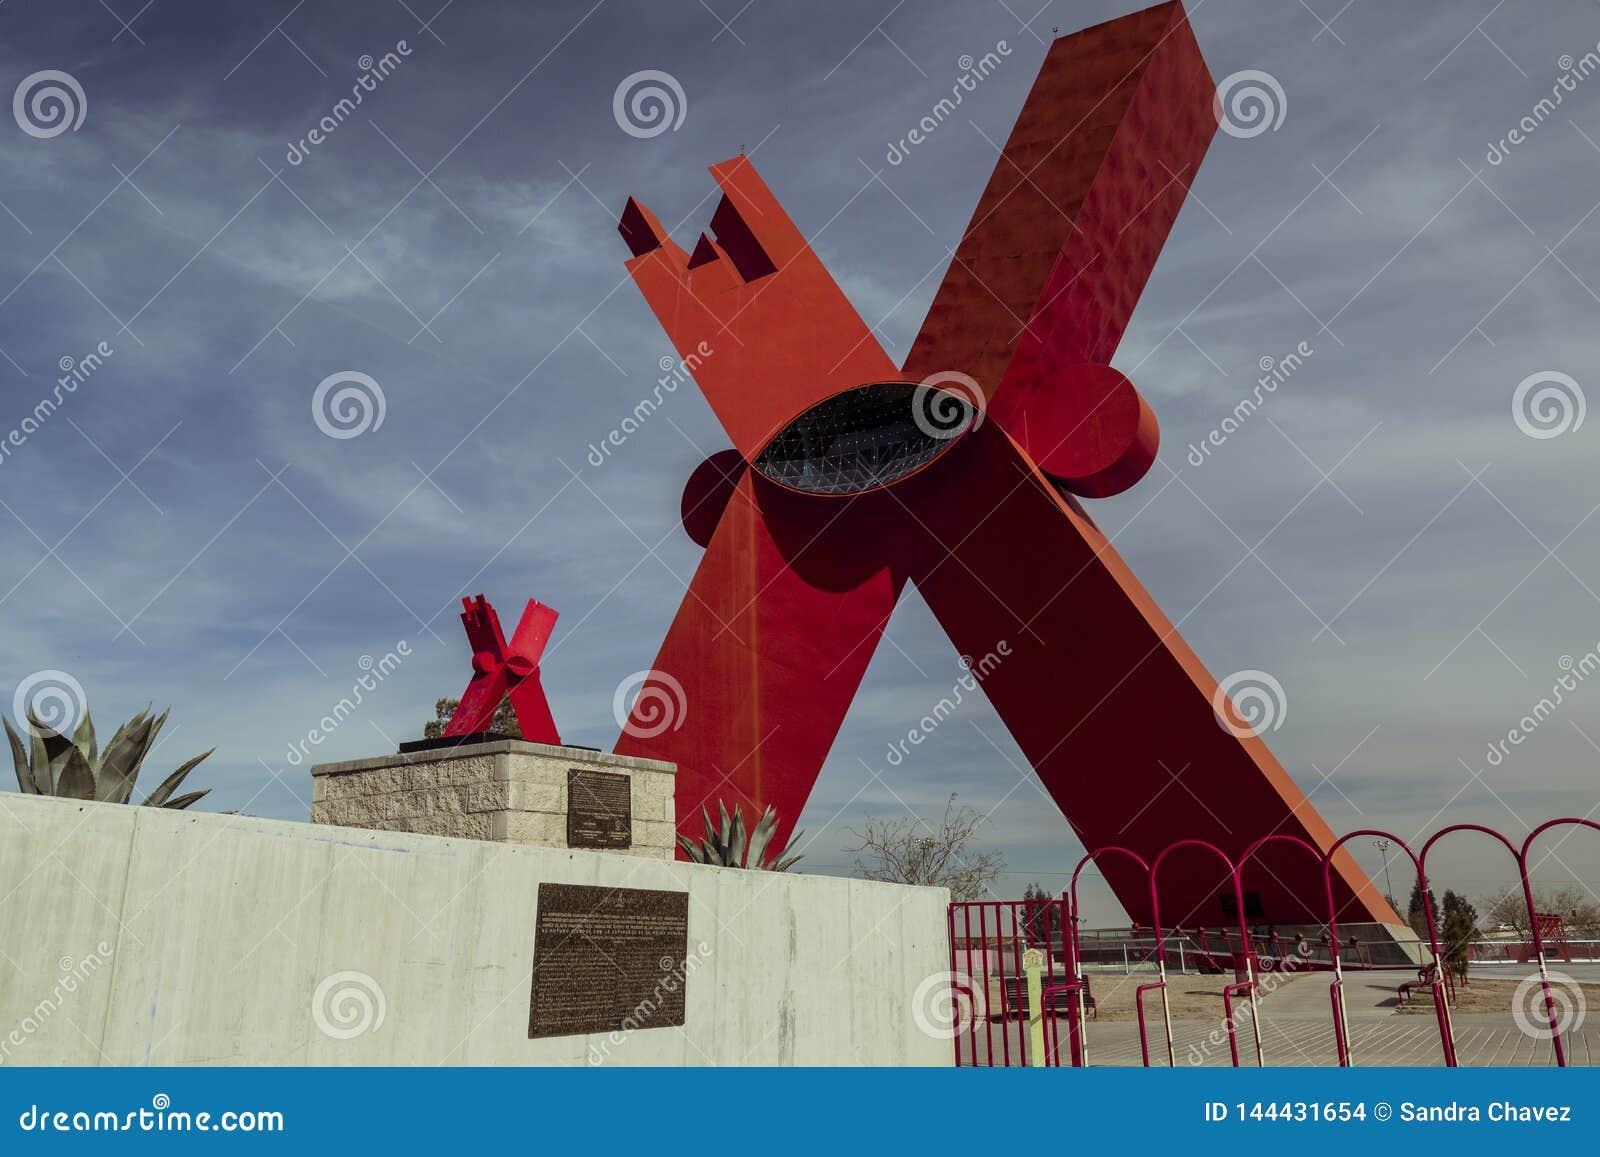 CIUDAD JUAREZ-CHIHUAHUA-MEXIKO-JANUARY-2019: Monument zum X in kleinem und in großem